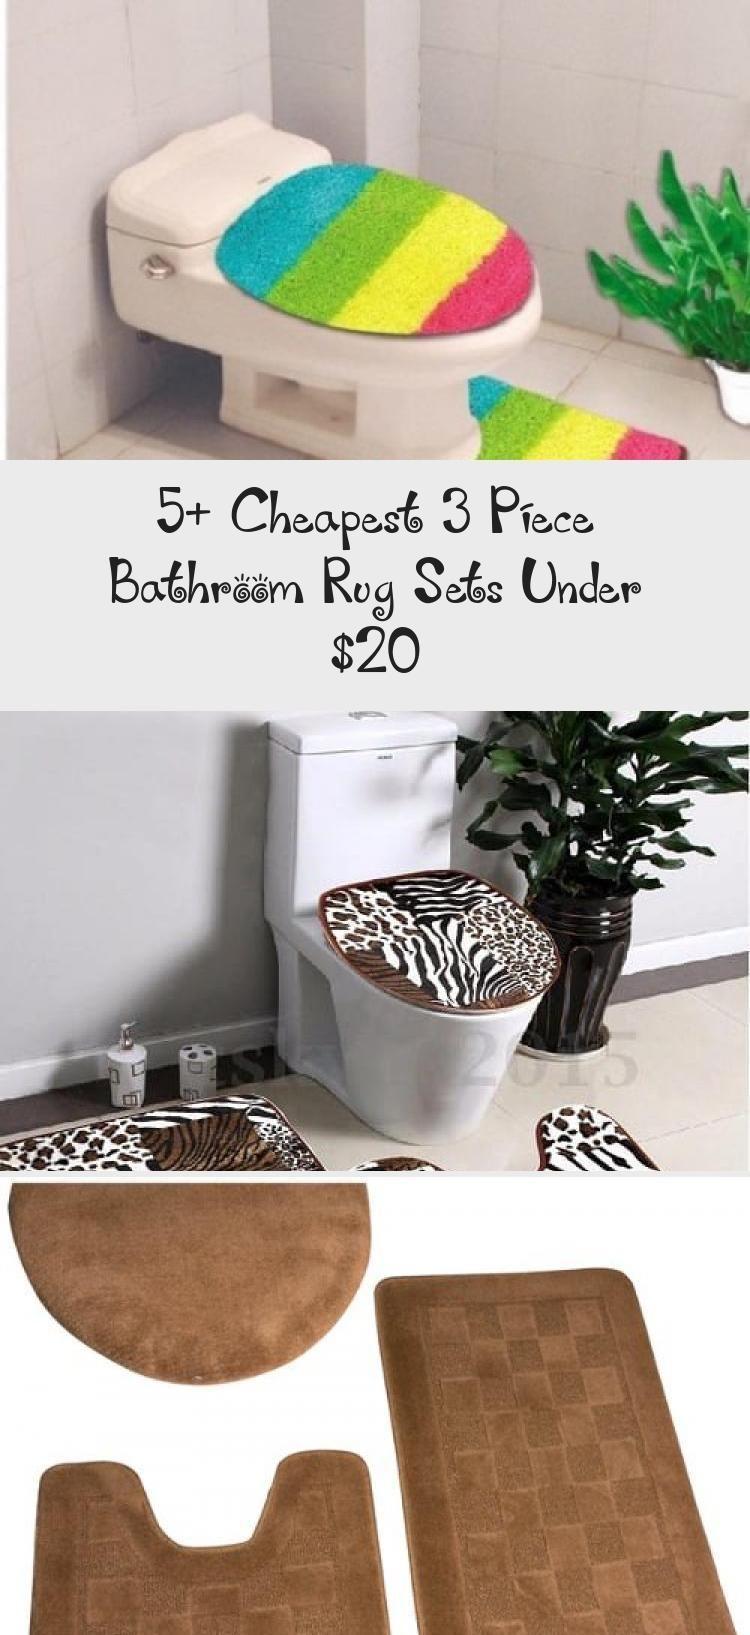 5 Cheapest 3 Piece Bathroom Rug Sets Under 20 Brushed Gold